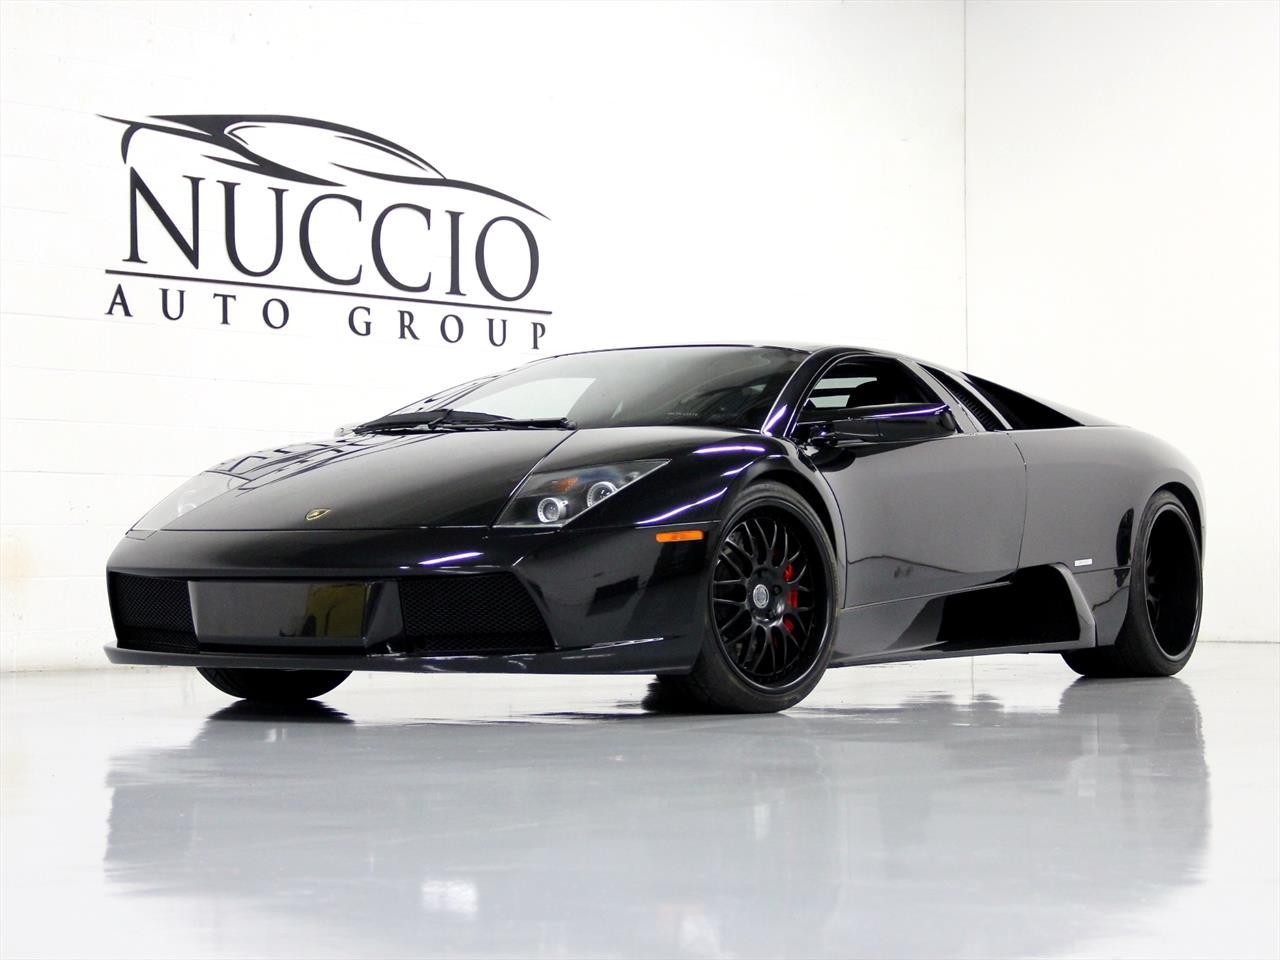 2002 Lamborghini Murcielago Coupe